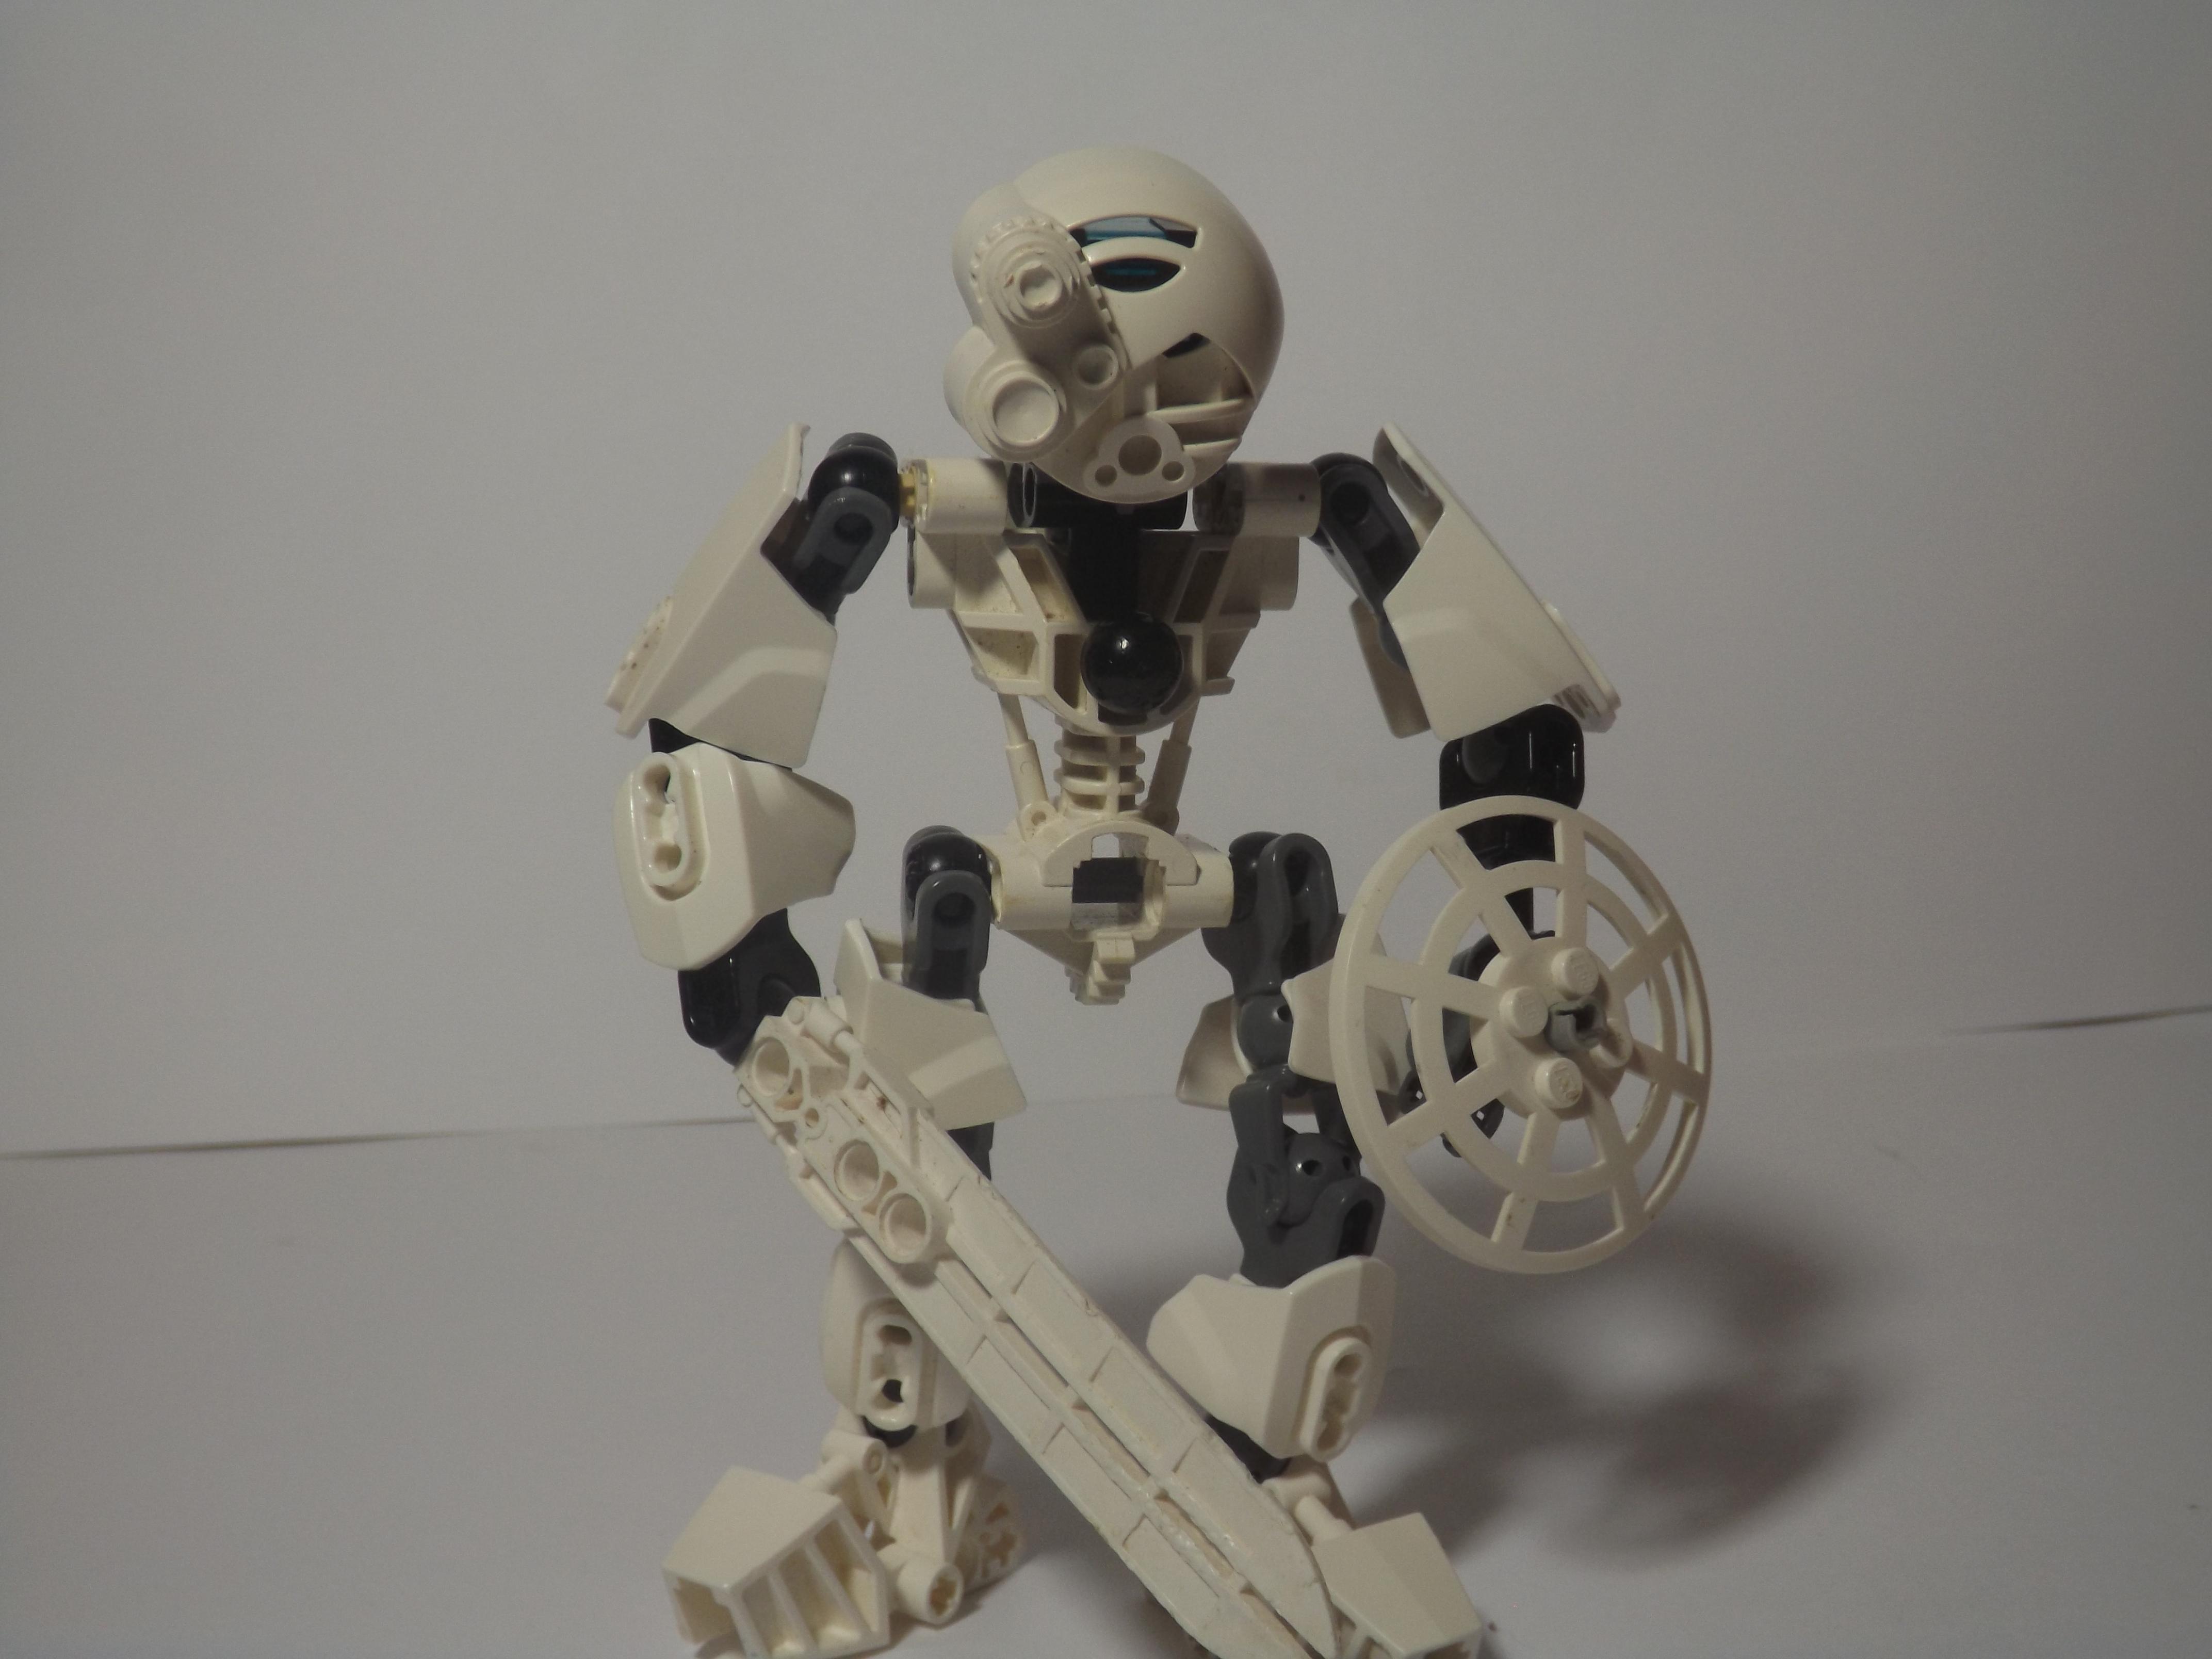 [MOC] Les mocs de Skrall789 (Nouveau Moc : MOCS BFGM : Akhatos - God of the Skull Spiders)  - Page 9 631075DSCF6554